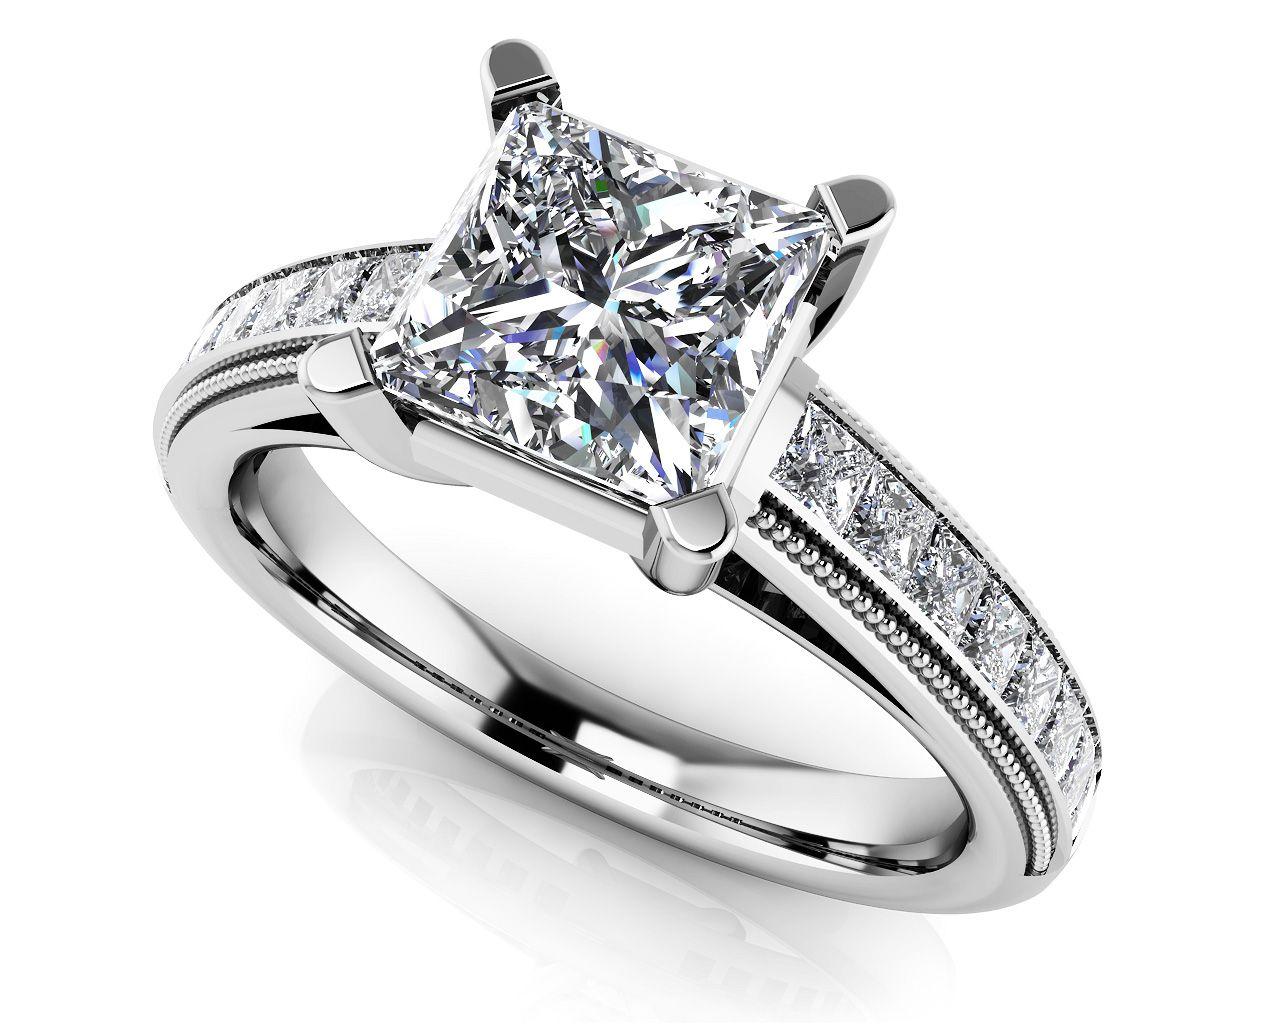 Princess Bride Engagement Ring Engagement rings, Wedding